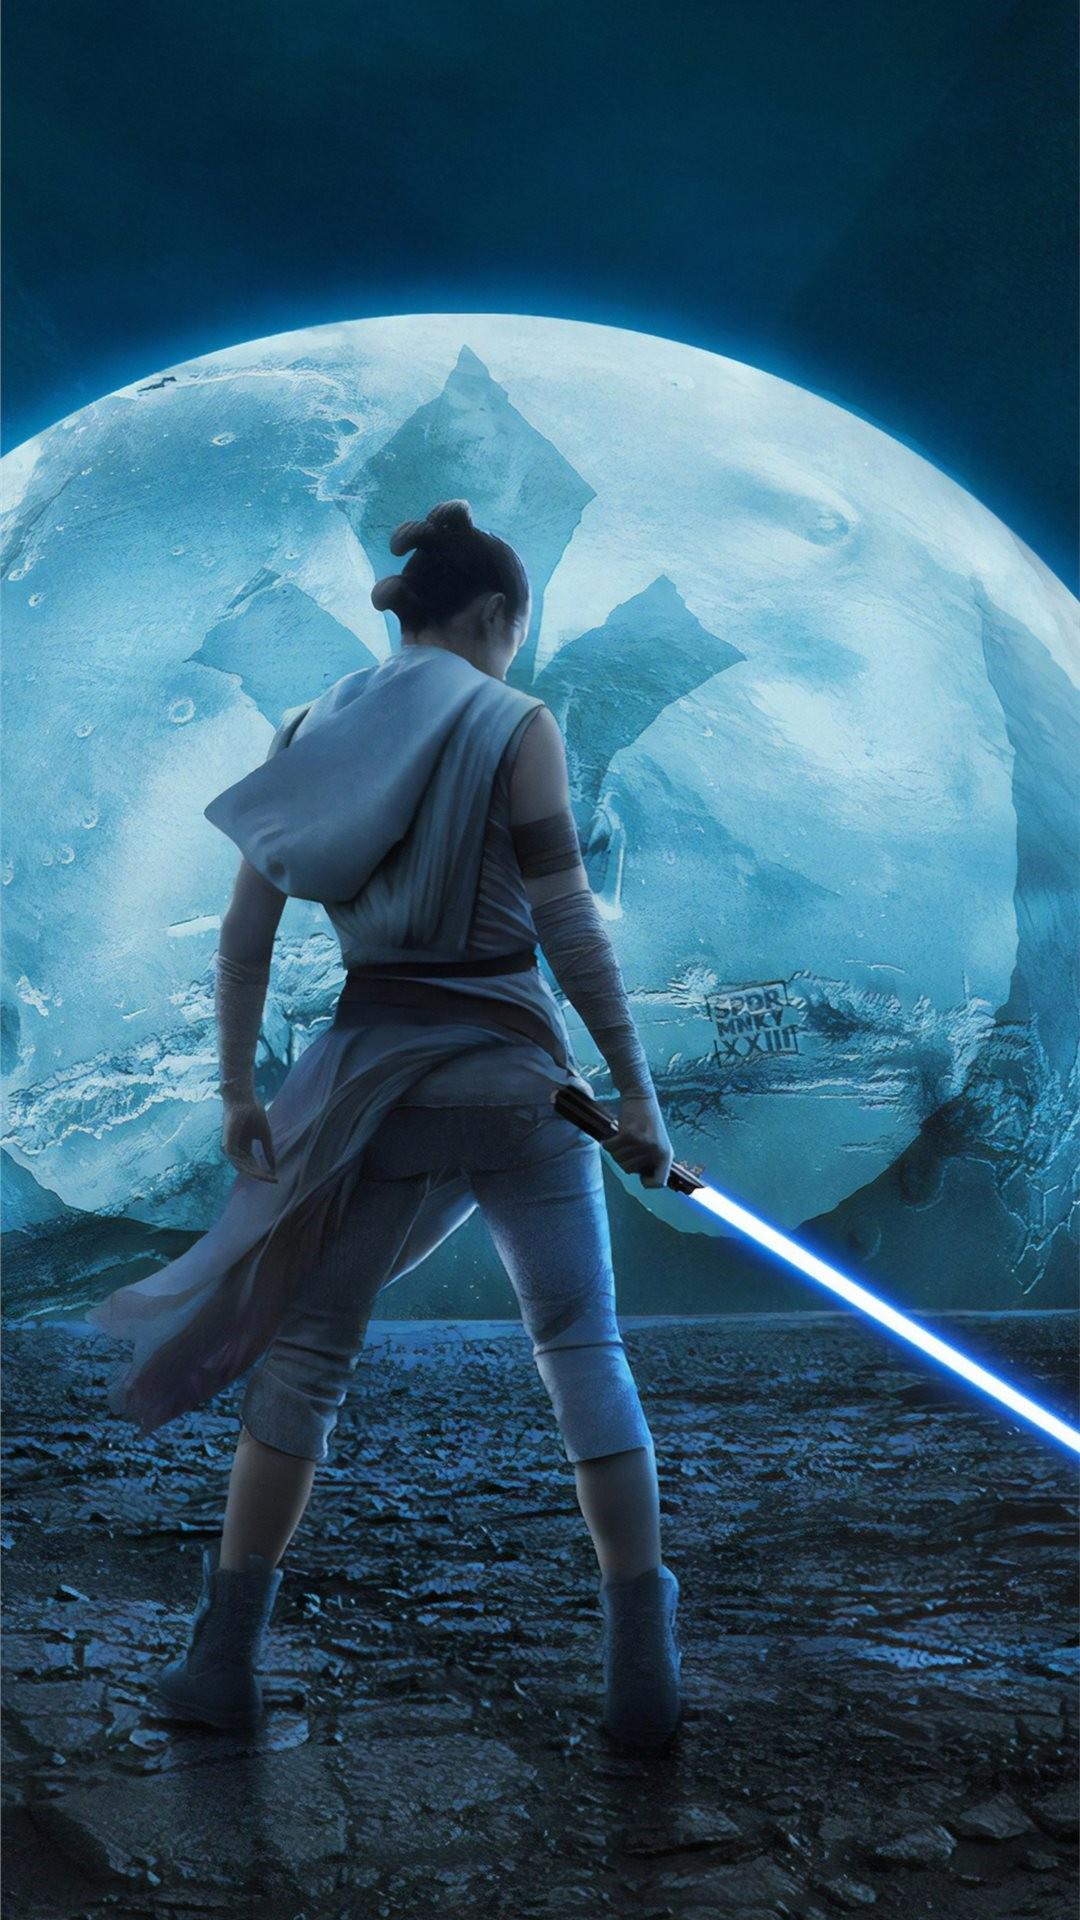 Star Wars The Rise Of Skywalker iphone 6 wallpaper